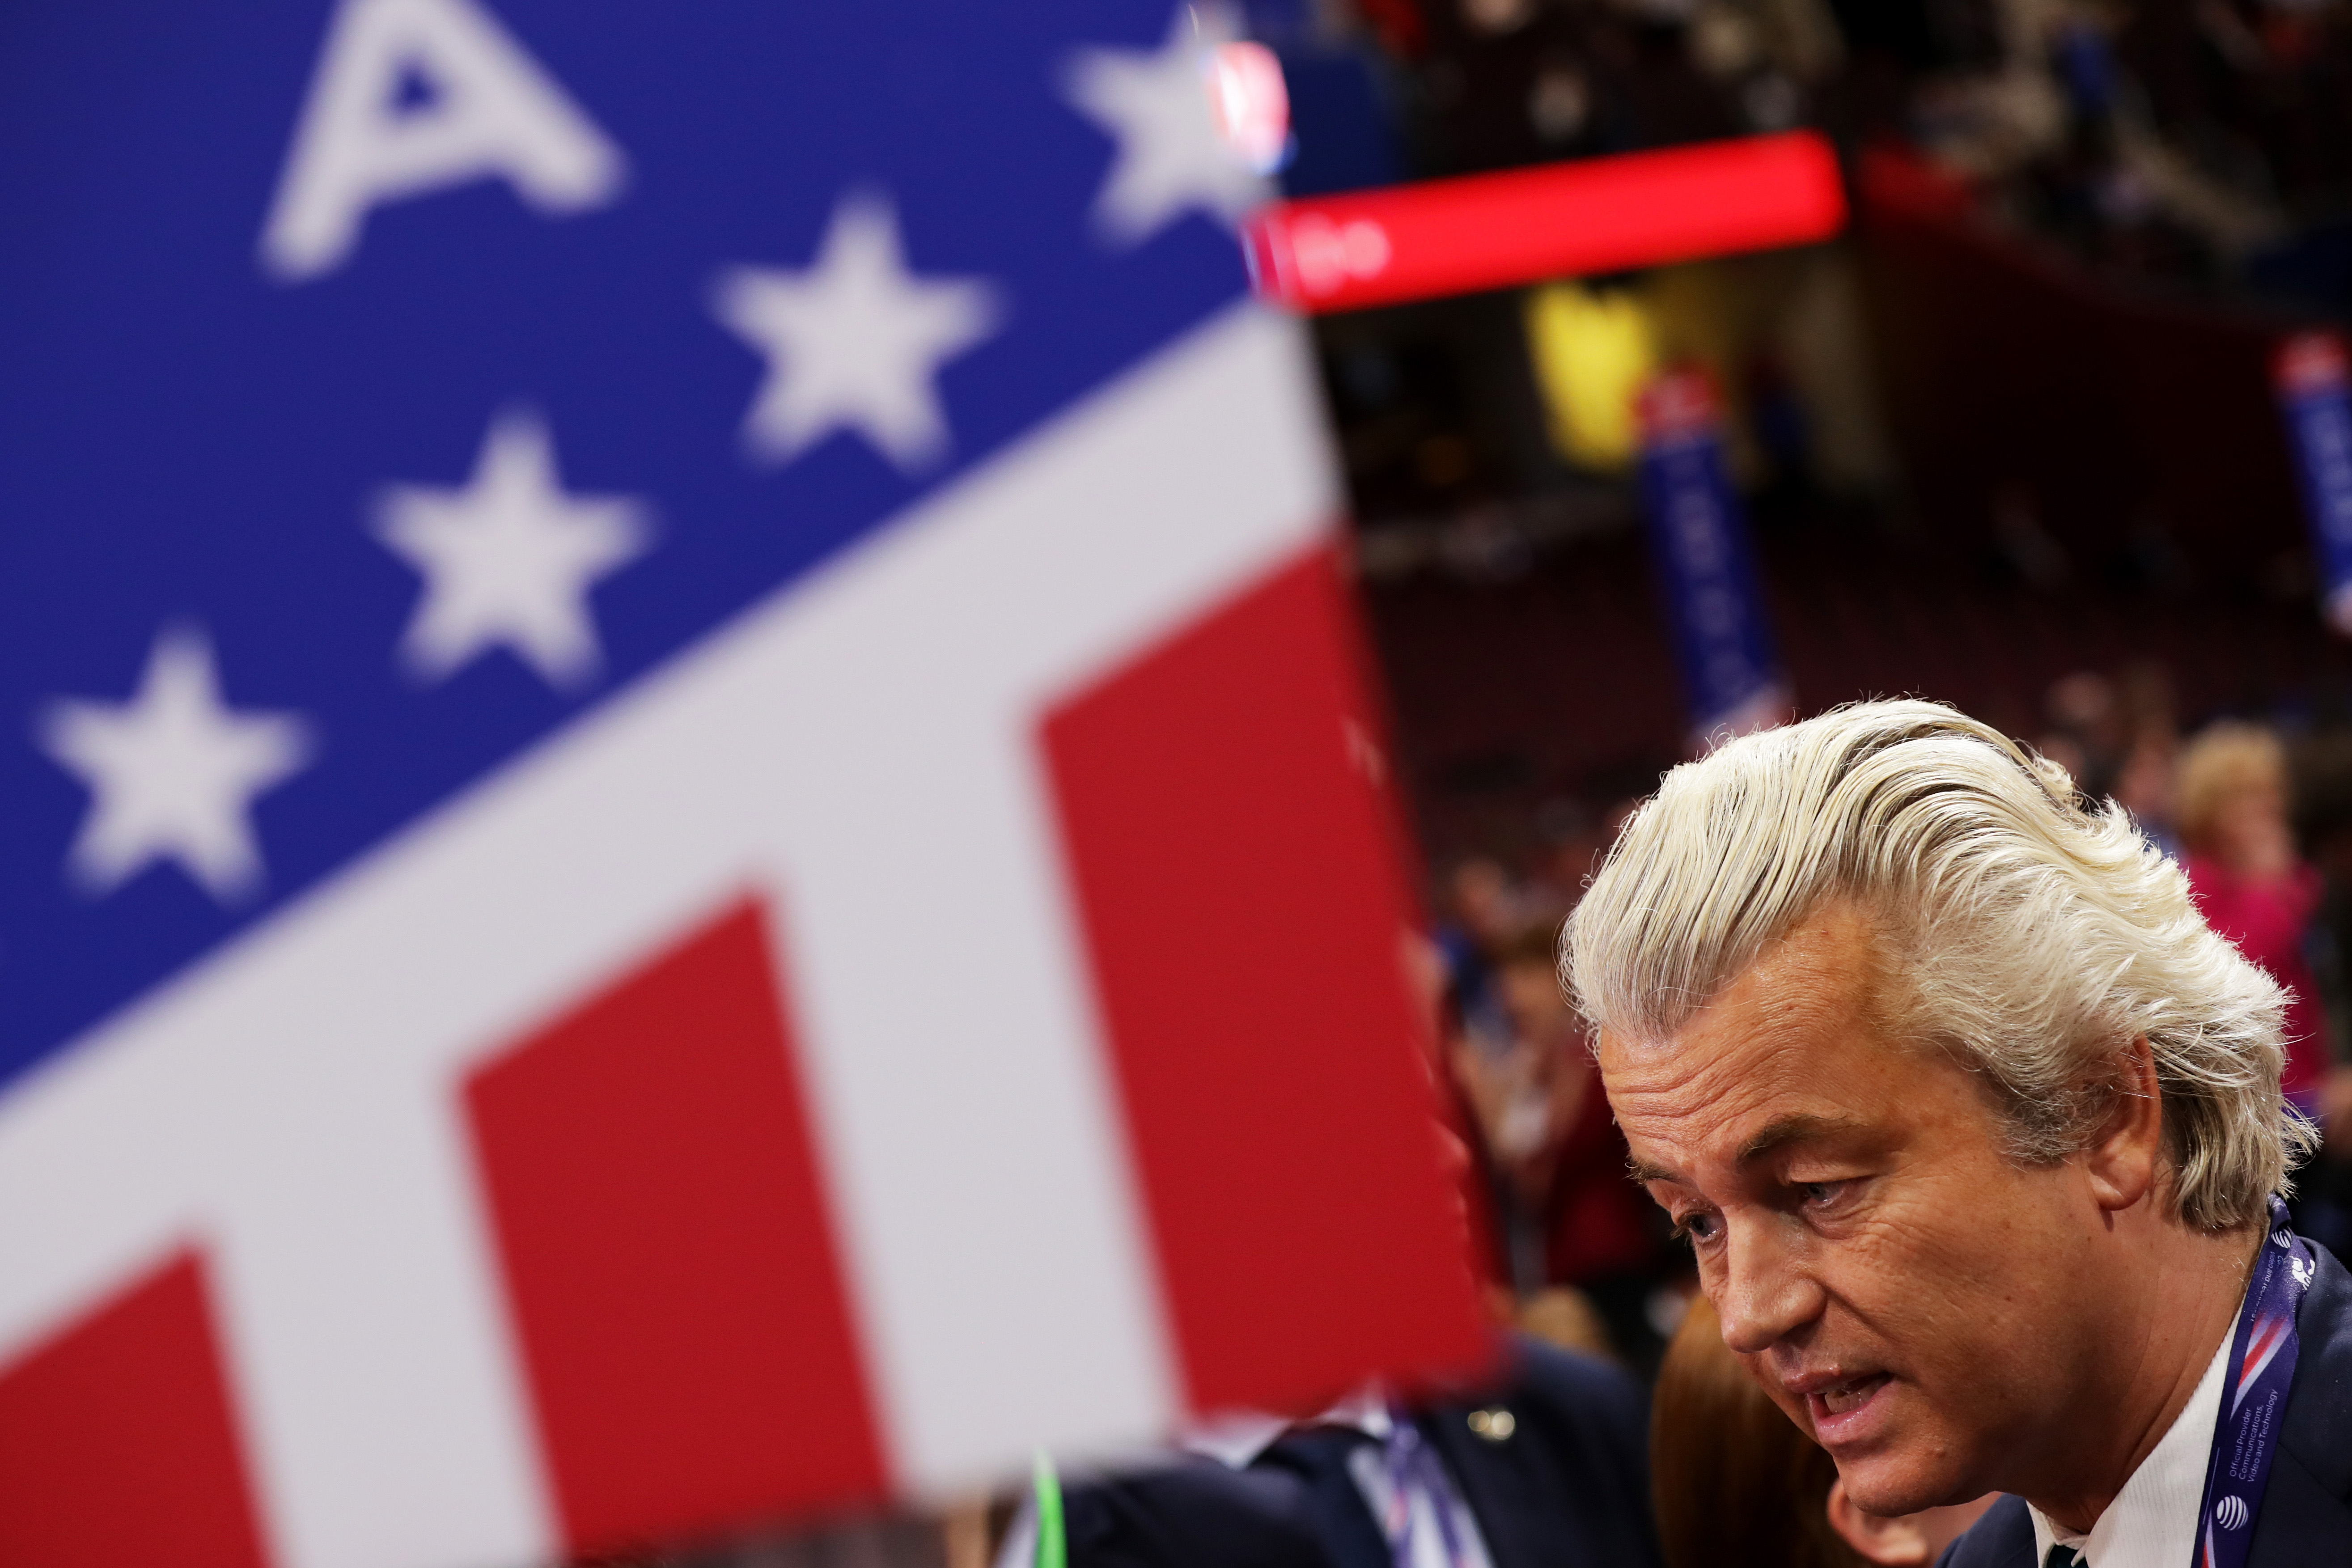 Geert wilders republican national convention.jpg?ixlib=rails 1.1